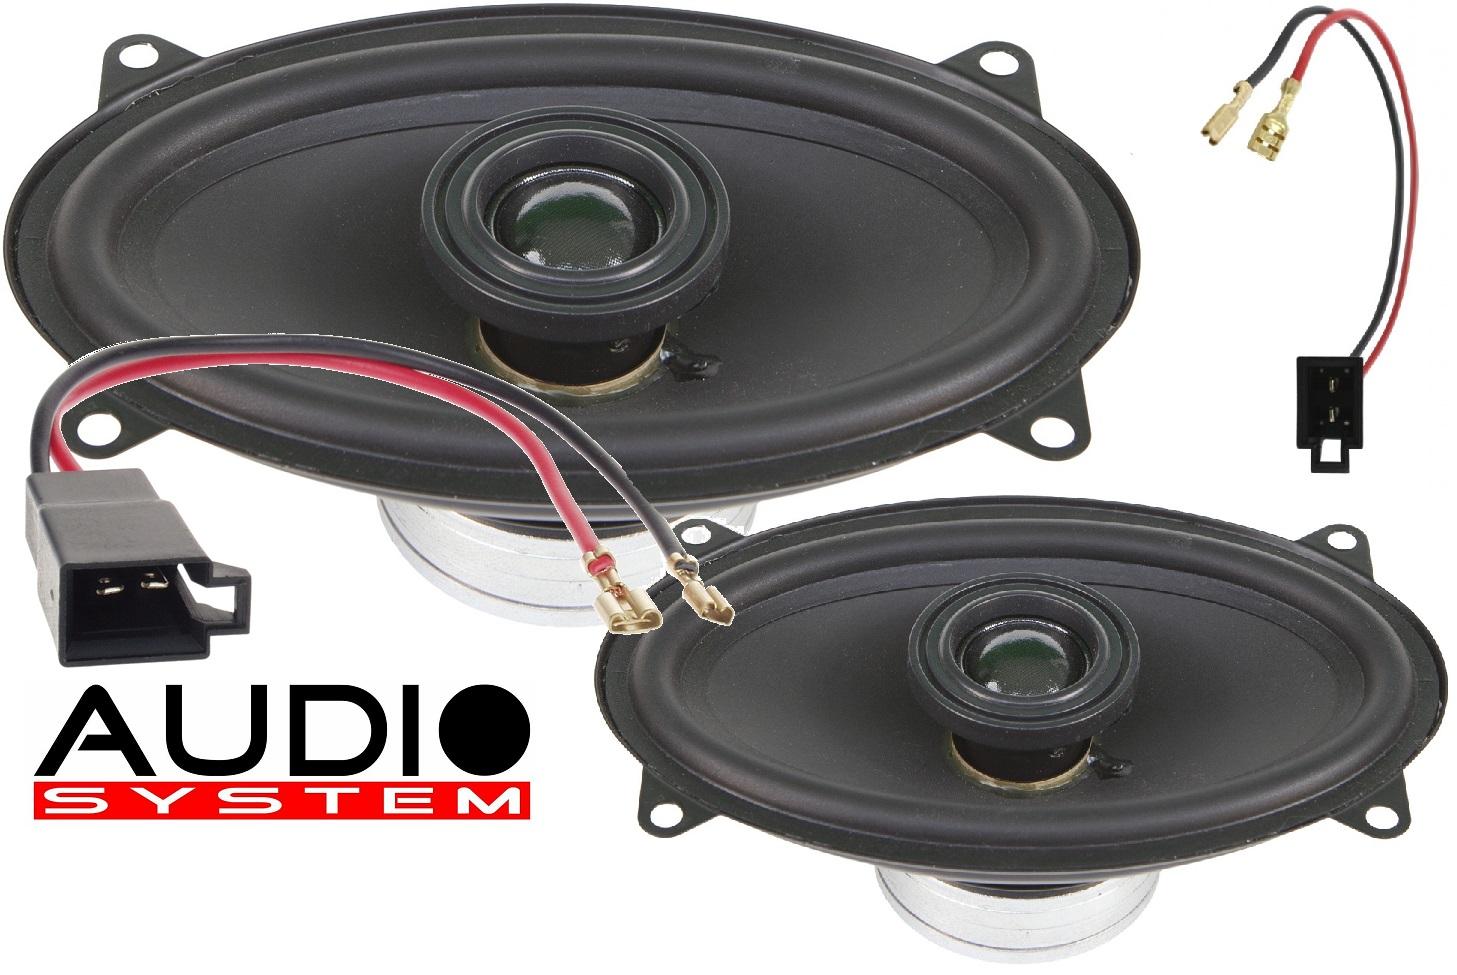 Audio System XCFIT VW SCIROCCO 1 EVO Lautsprecher X-SERIES 4x6 Neodym Spezial Coaxial System SCIROCCO 1 Paar